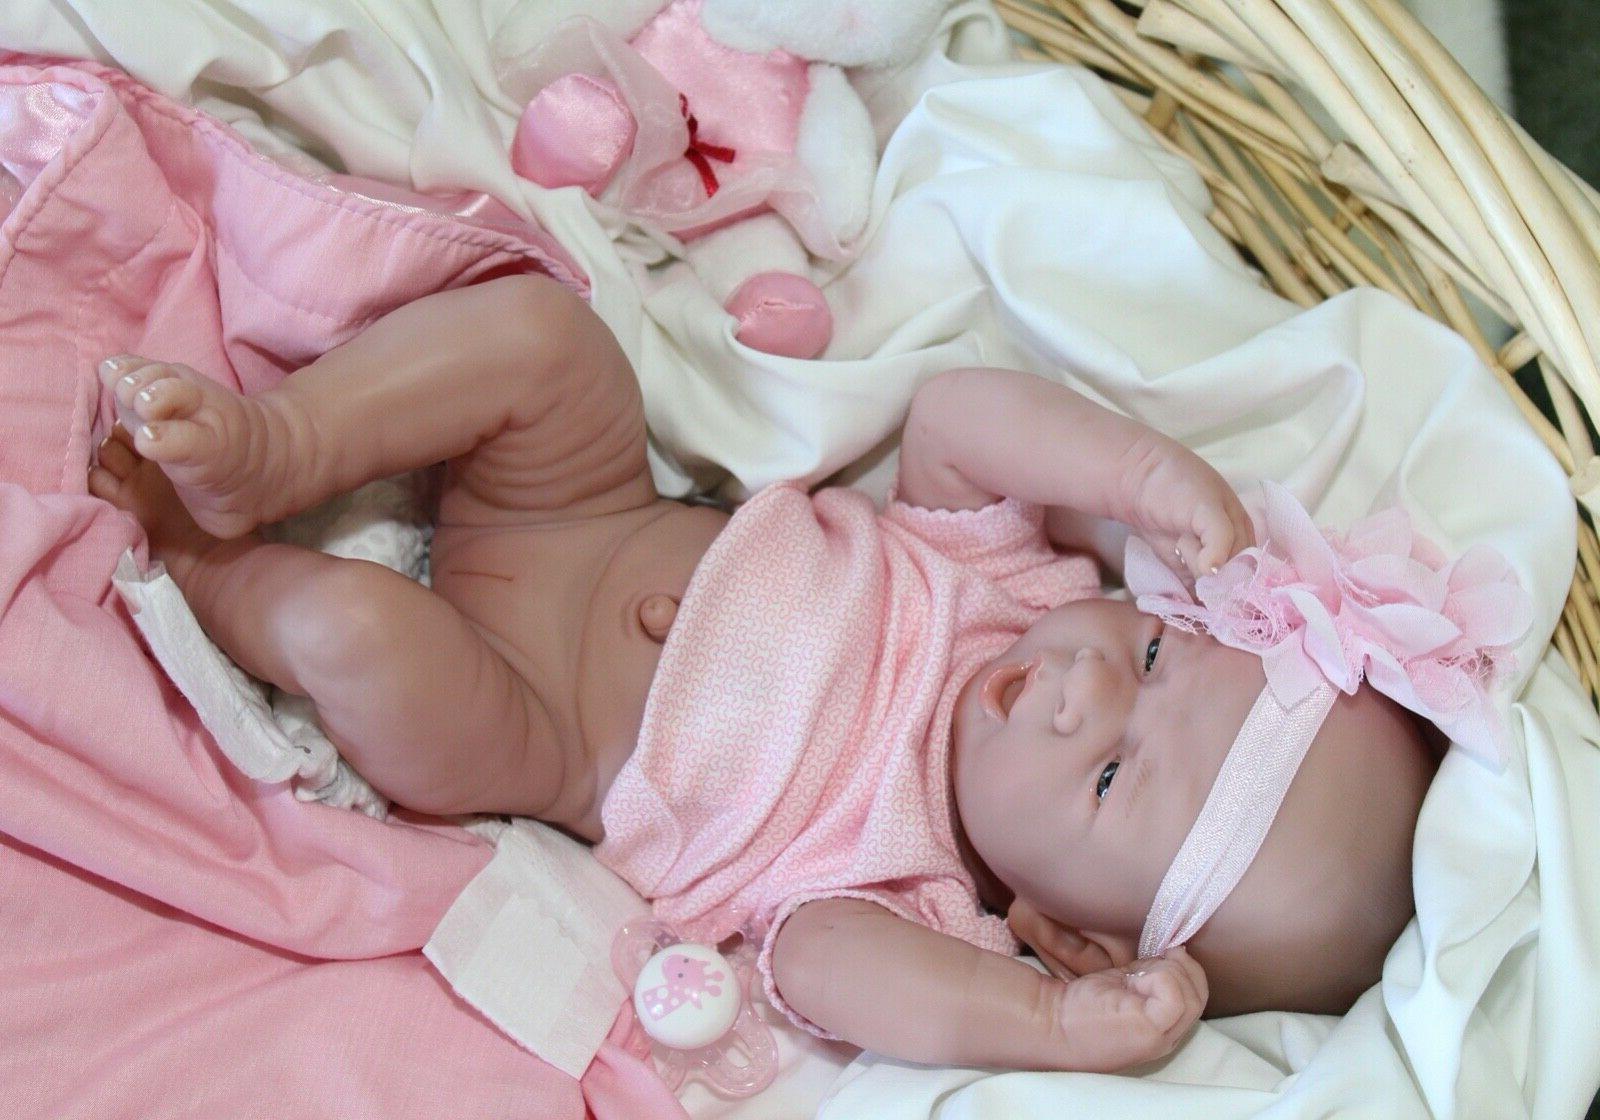 AWW! It's Baby Berenguer Life Like Reborn